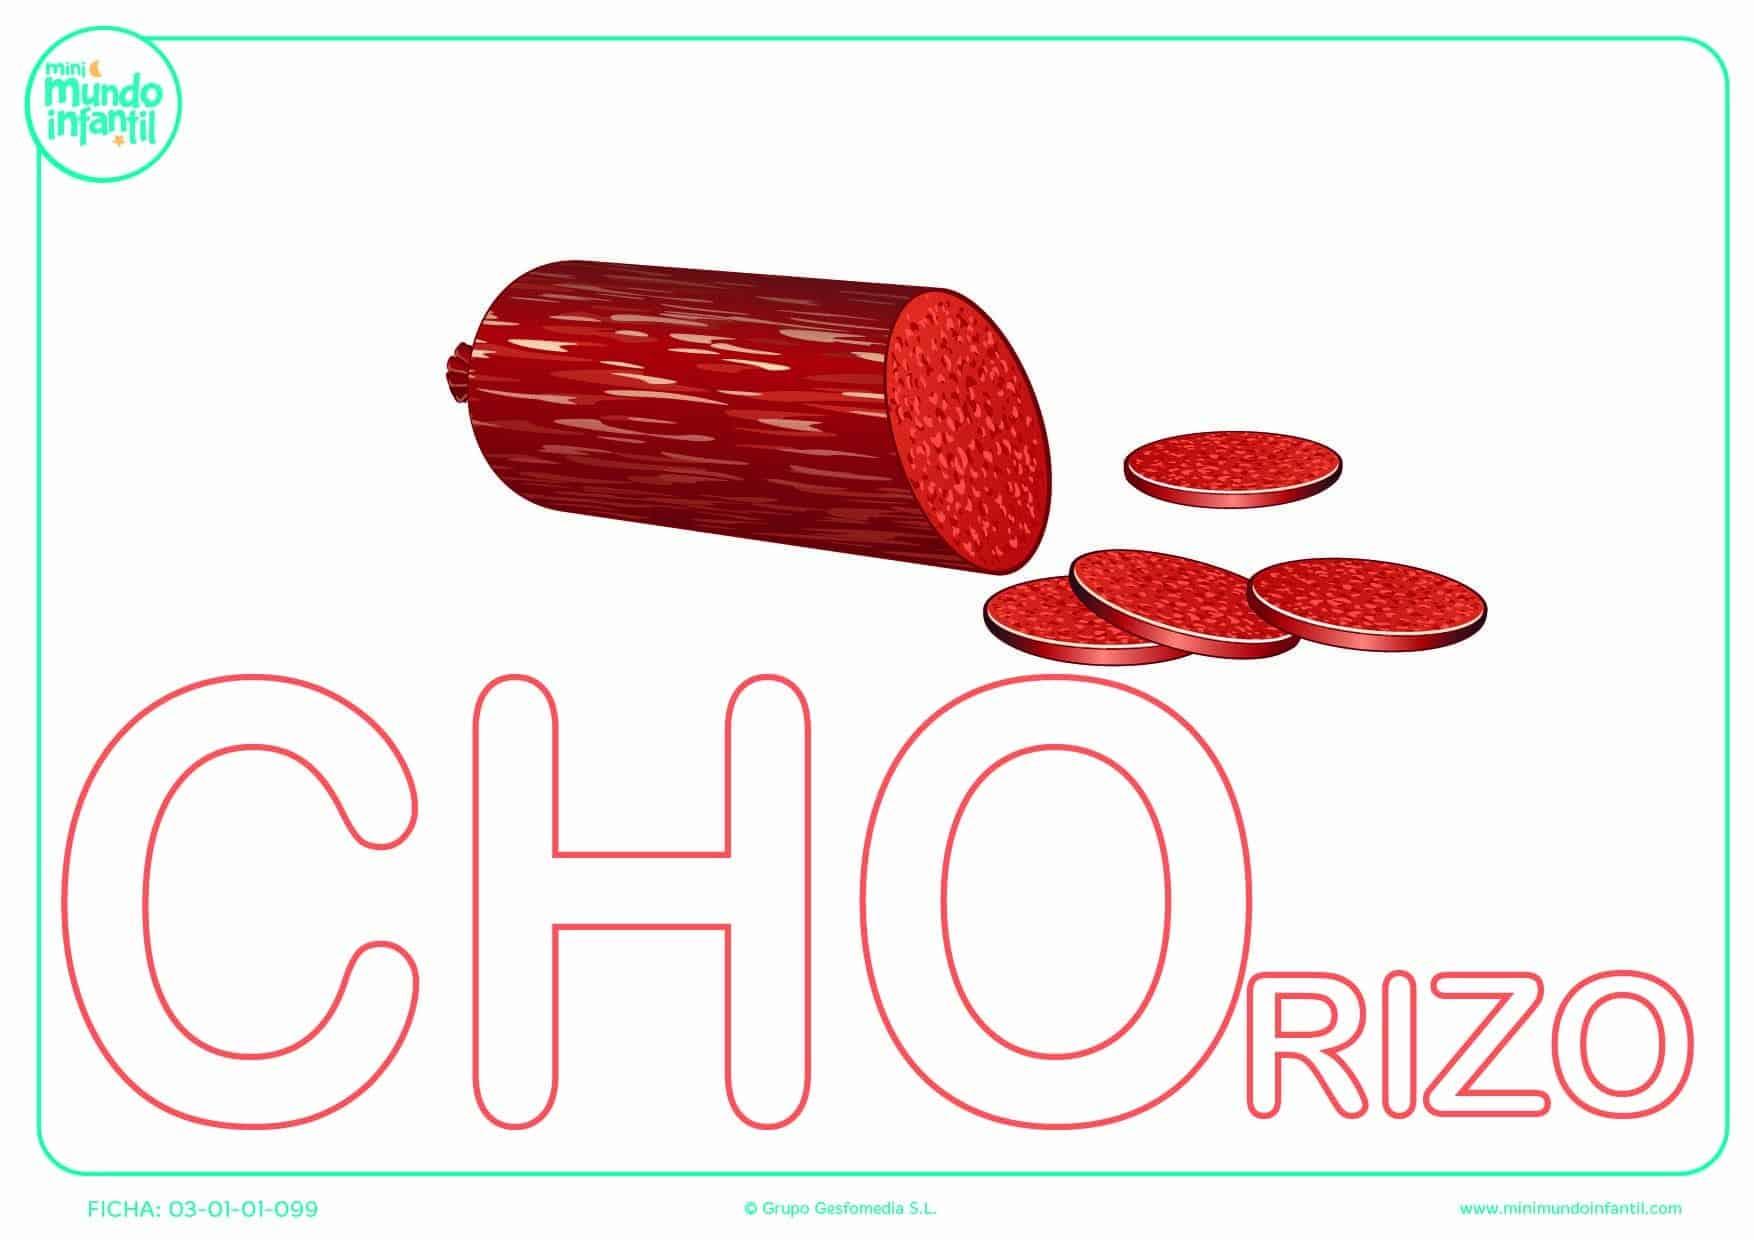 Completar la sílaba CHO mayúscula de chorizo